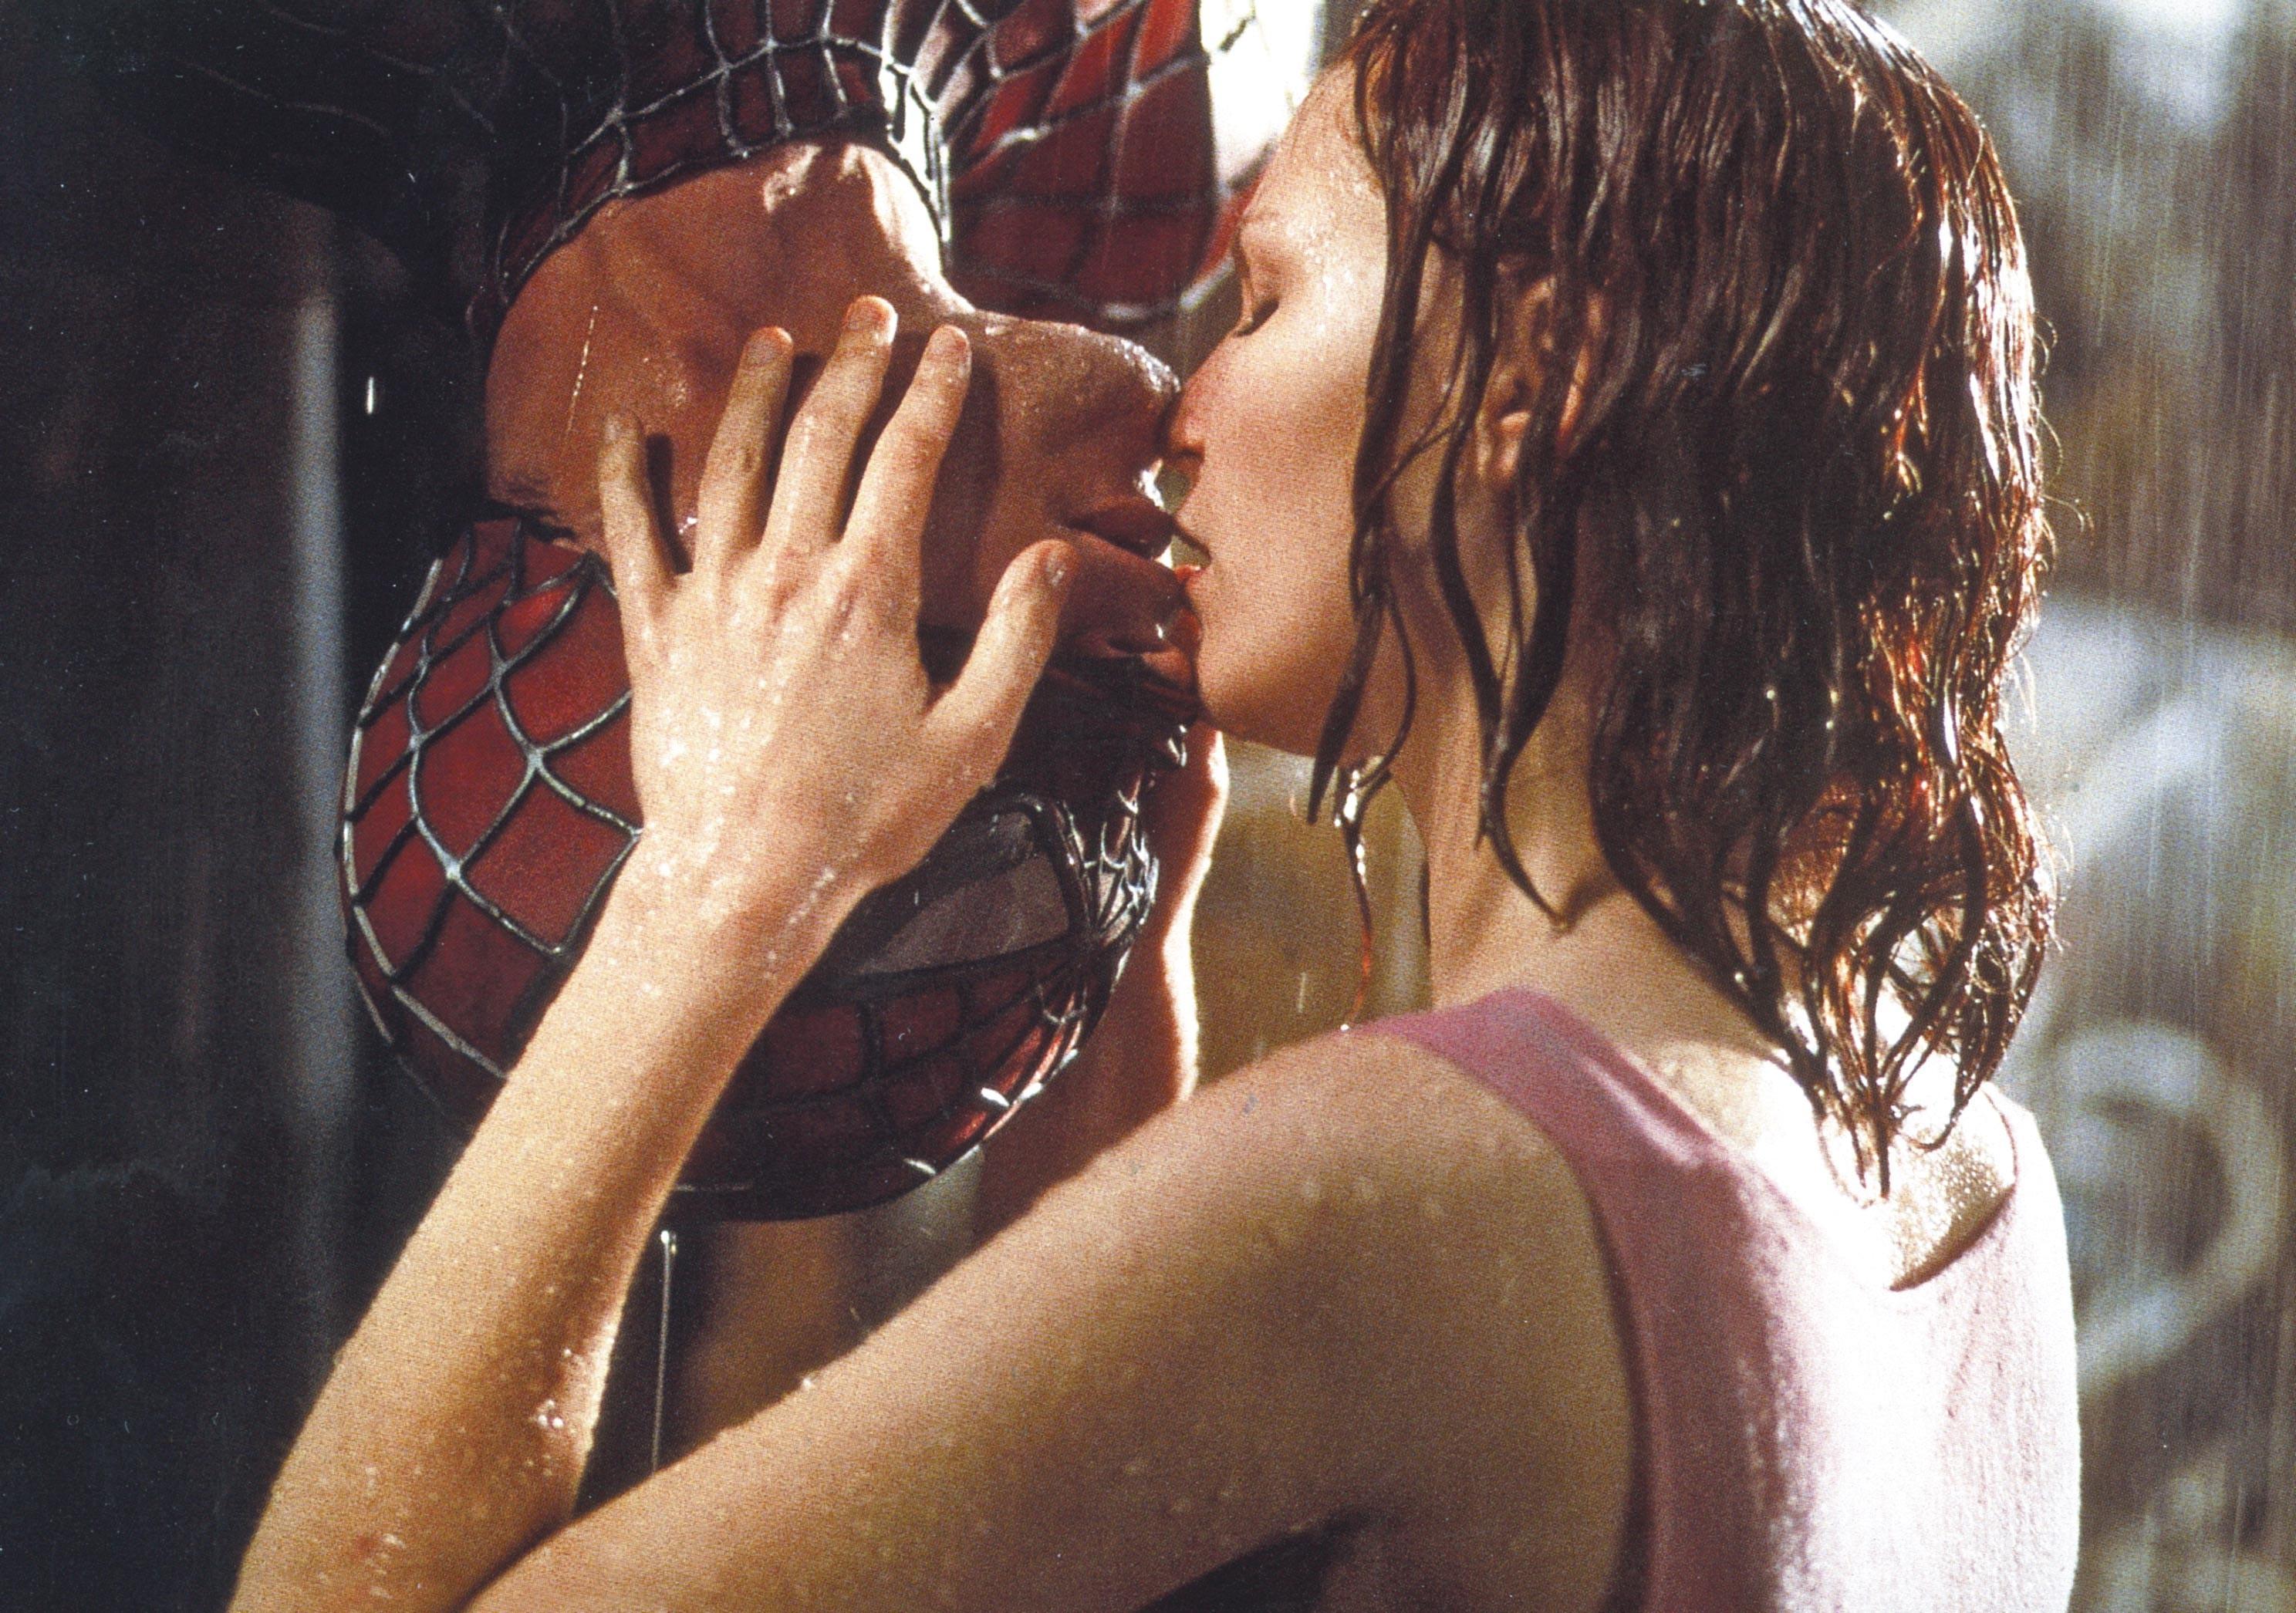 Un baiser renversant